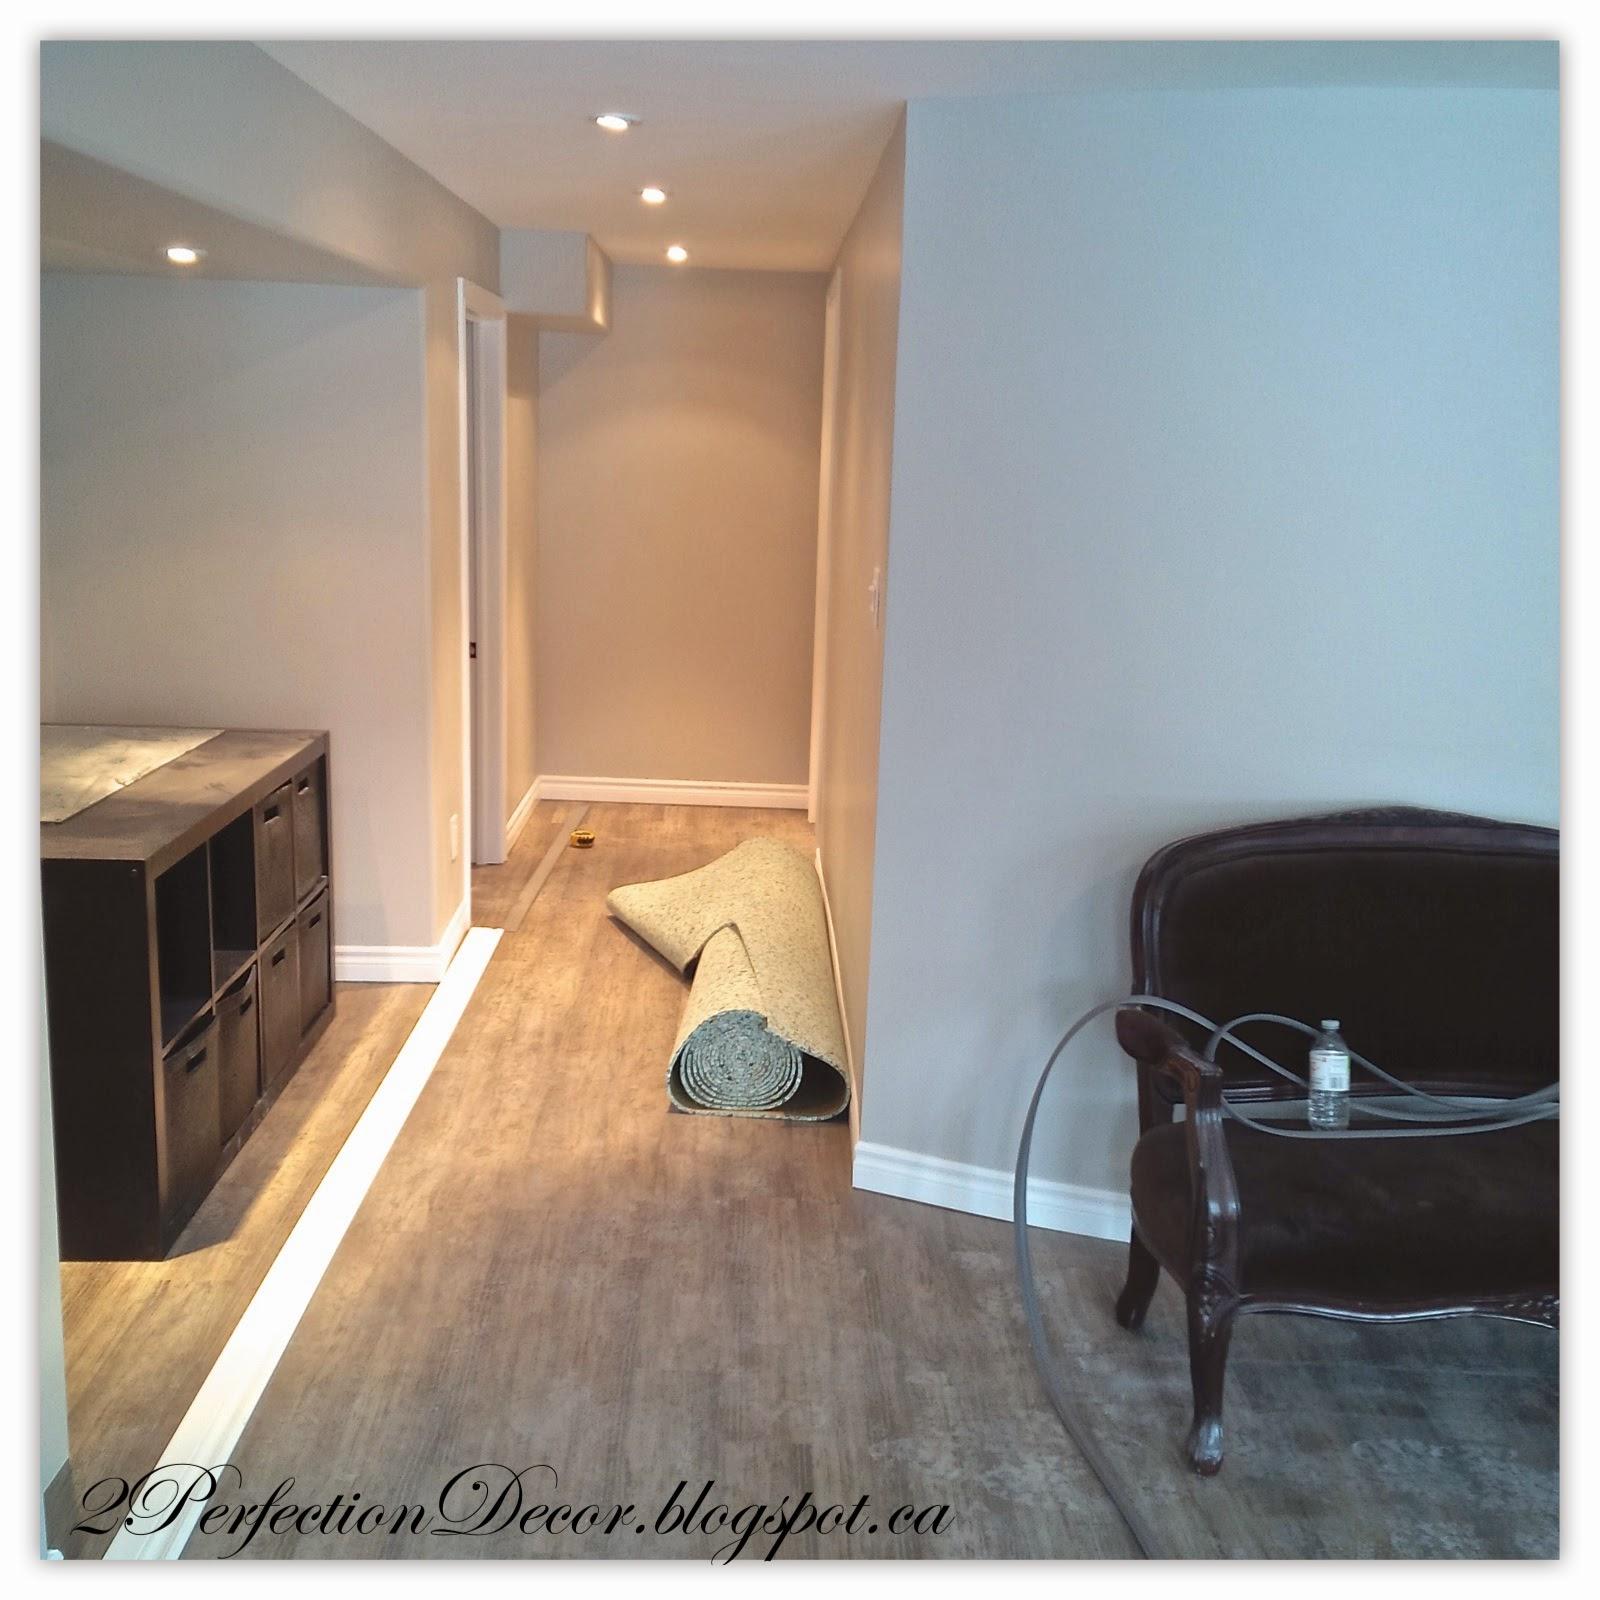 2Perfection Decor: Basement Flooring Gets Installed